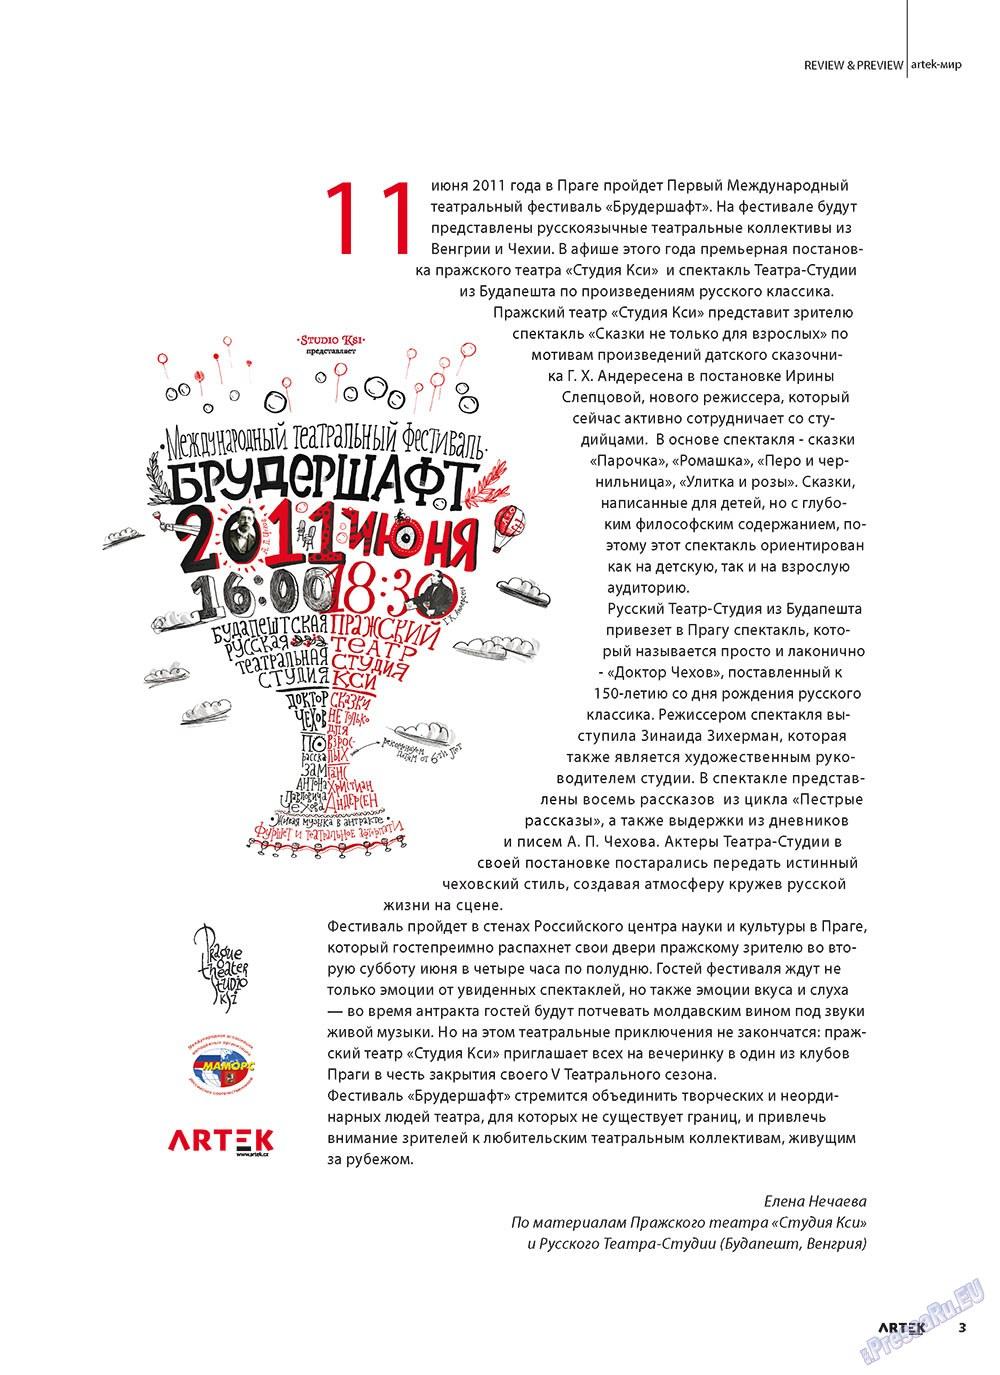 Артек (журнал). 2011 год, номер 2, стр. 5